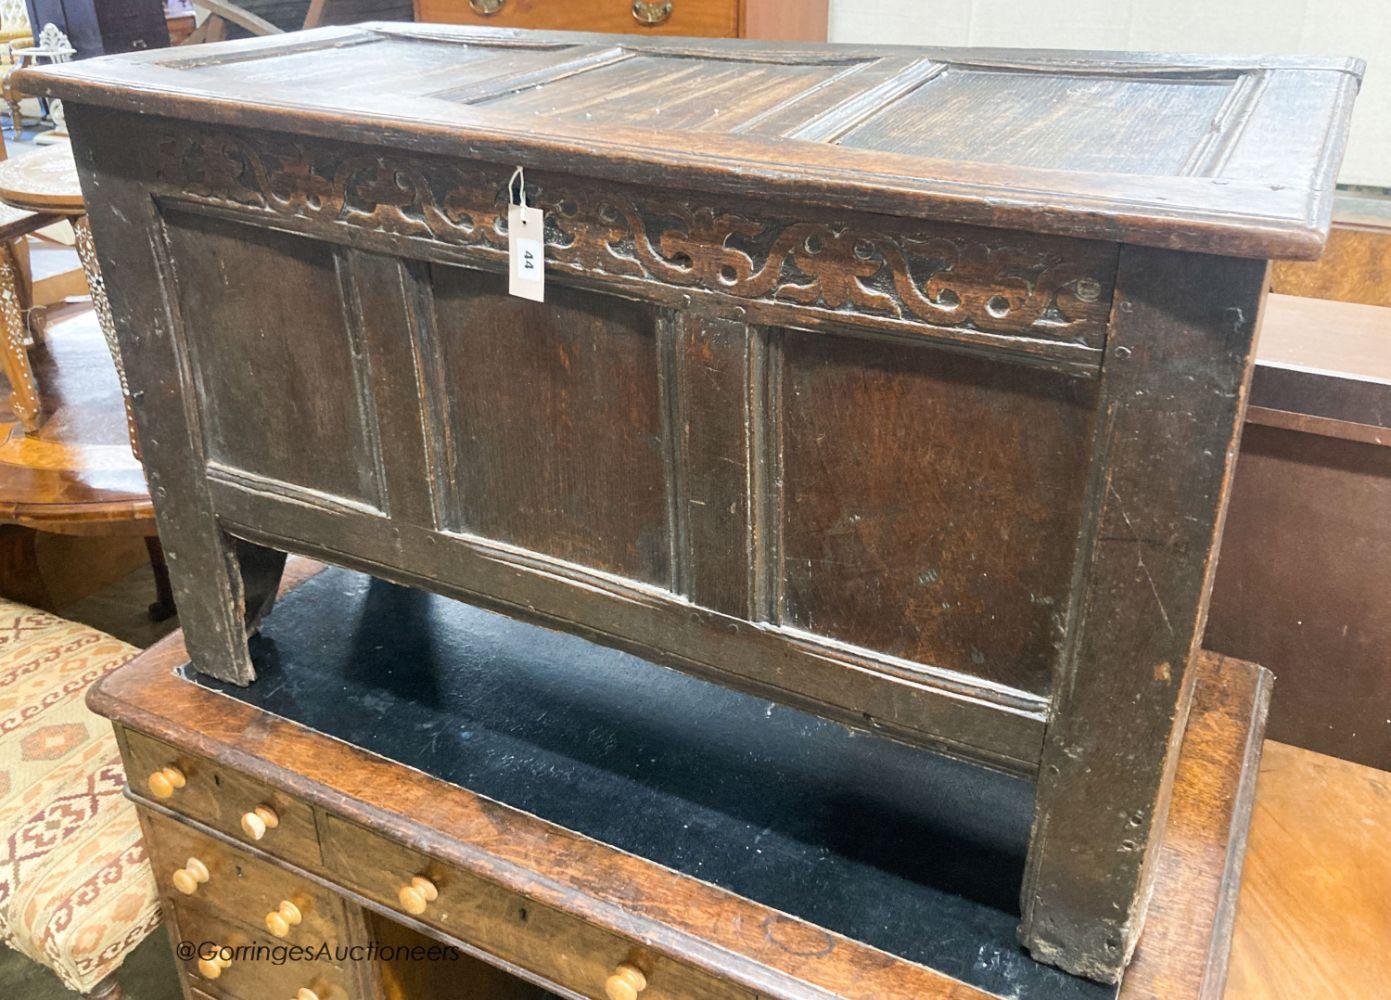 Gorringes Weekly Antiques Sale - Monday 1st November 2021